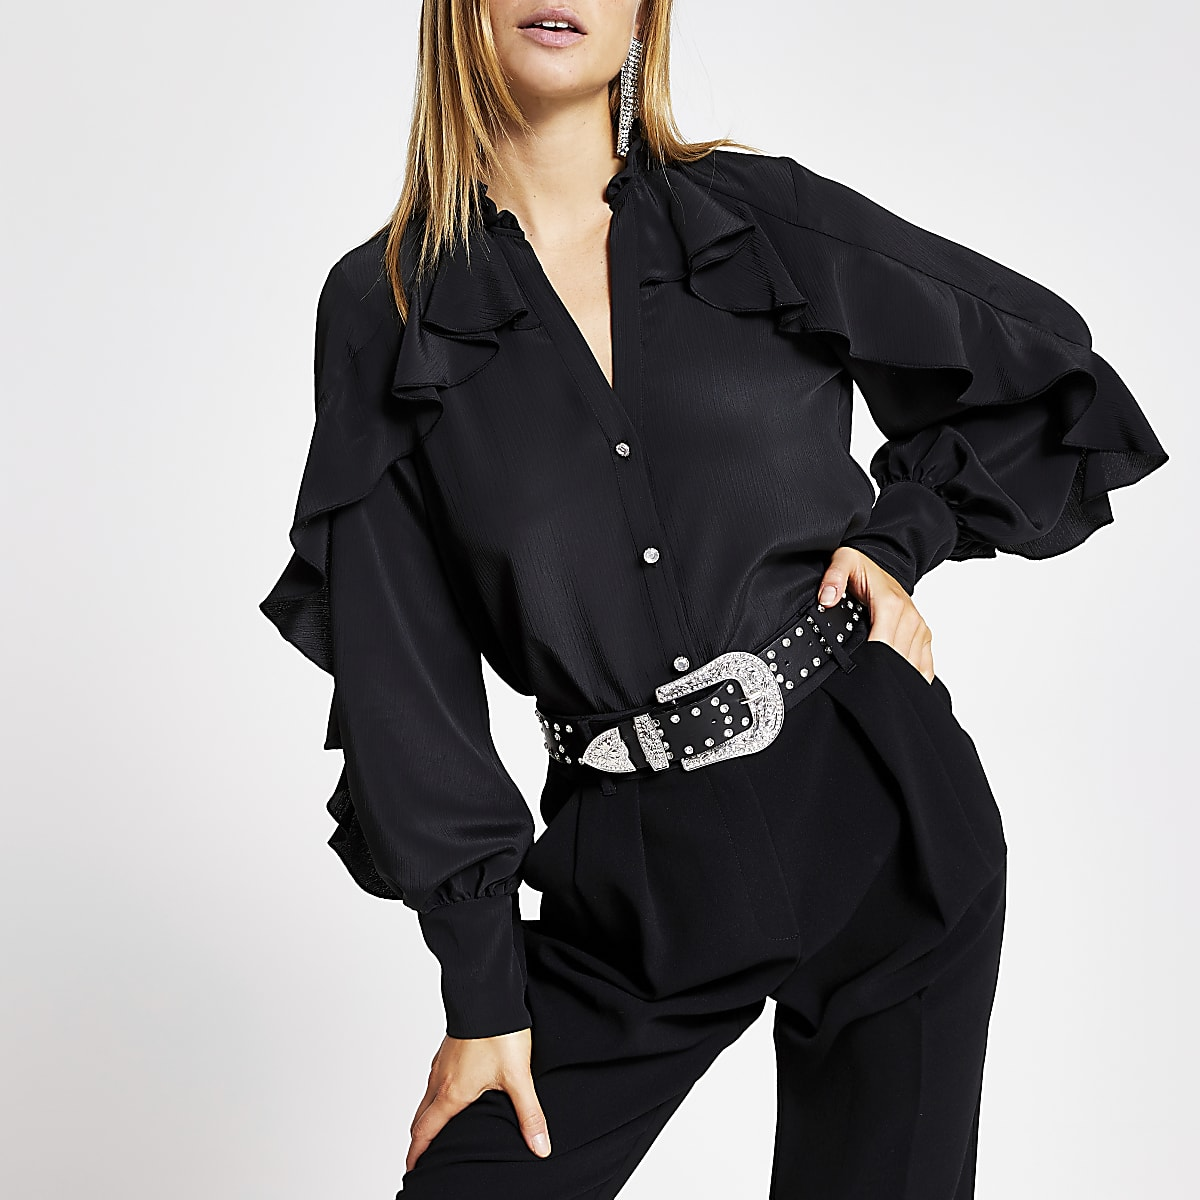 Black long sleeve frill shirt